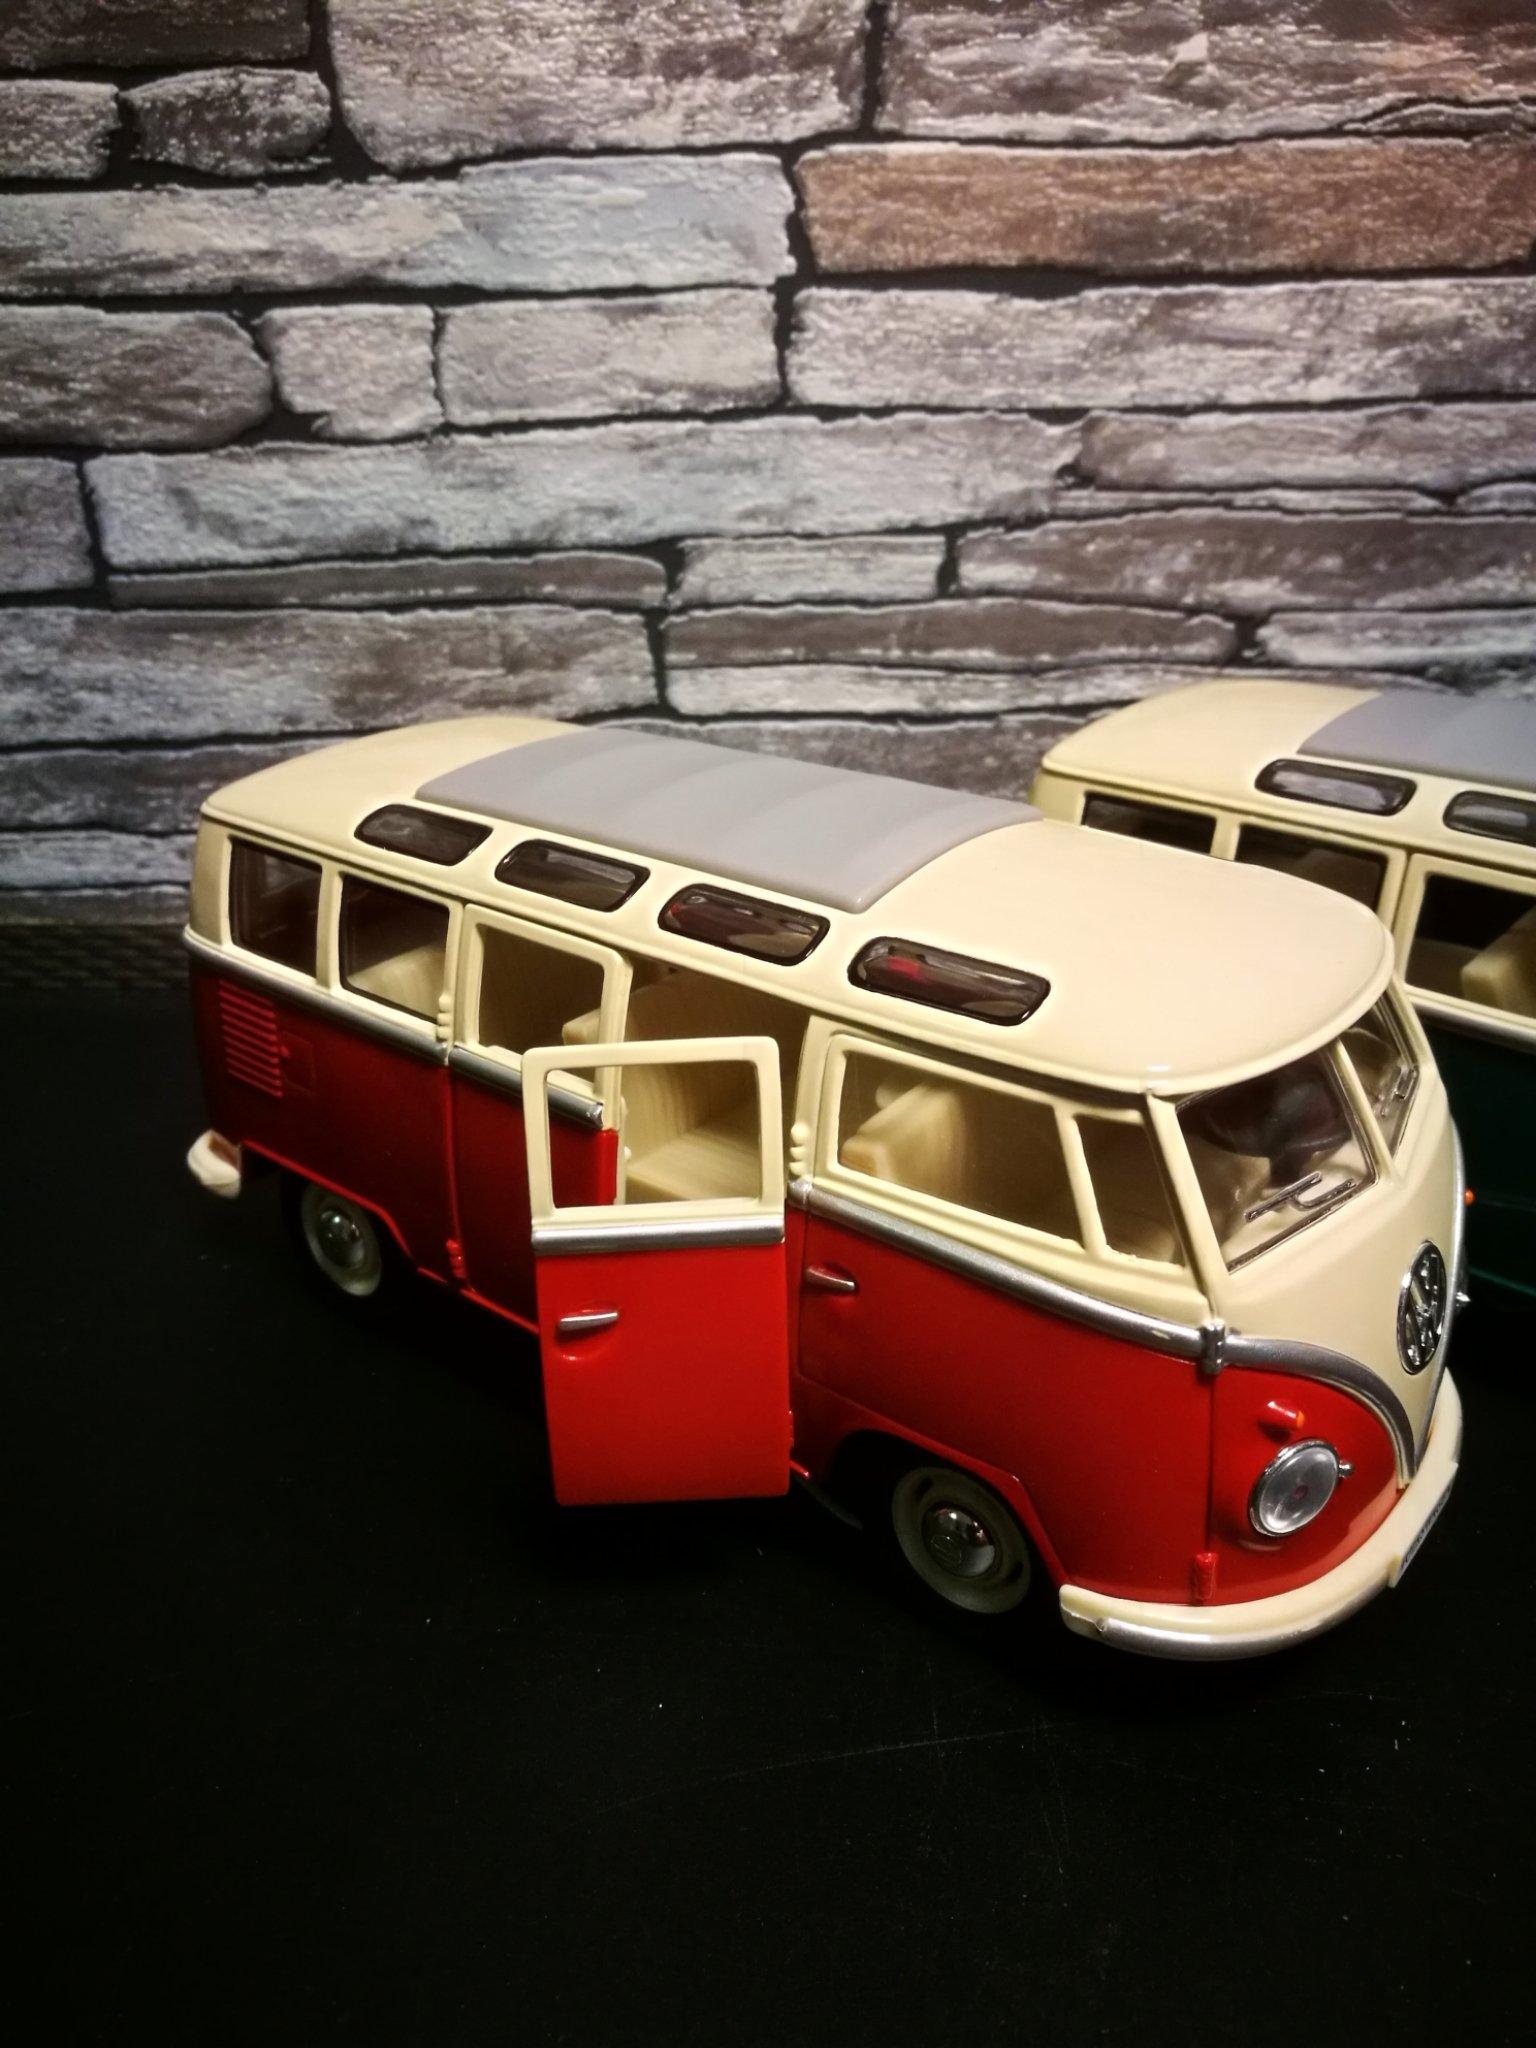 VW classic bus 1962